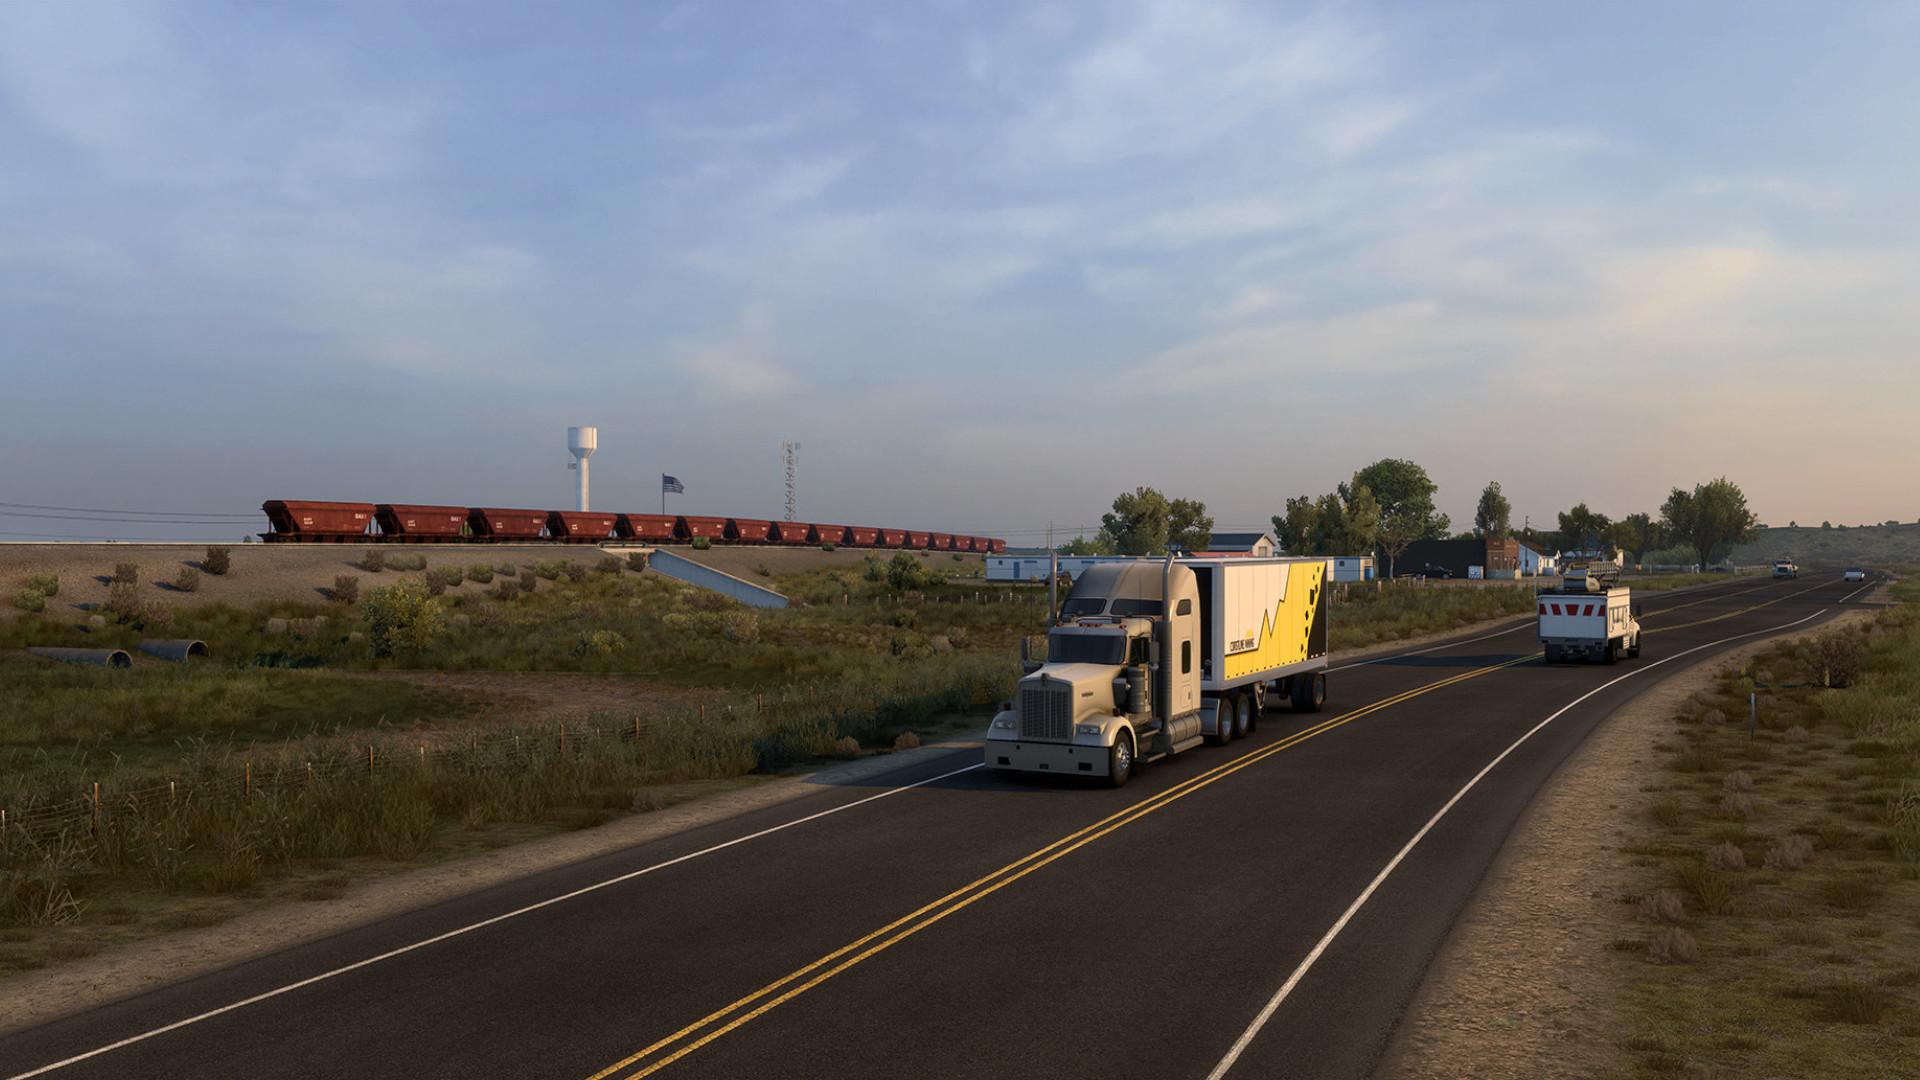 Here's 25 minutes of someone driving around Wyoming in American Truck Simulator